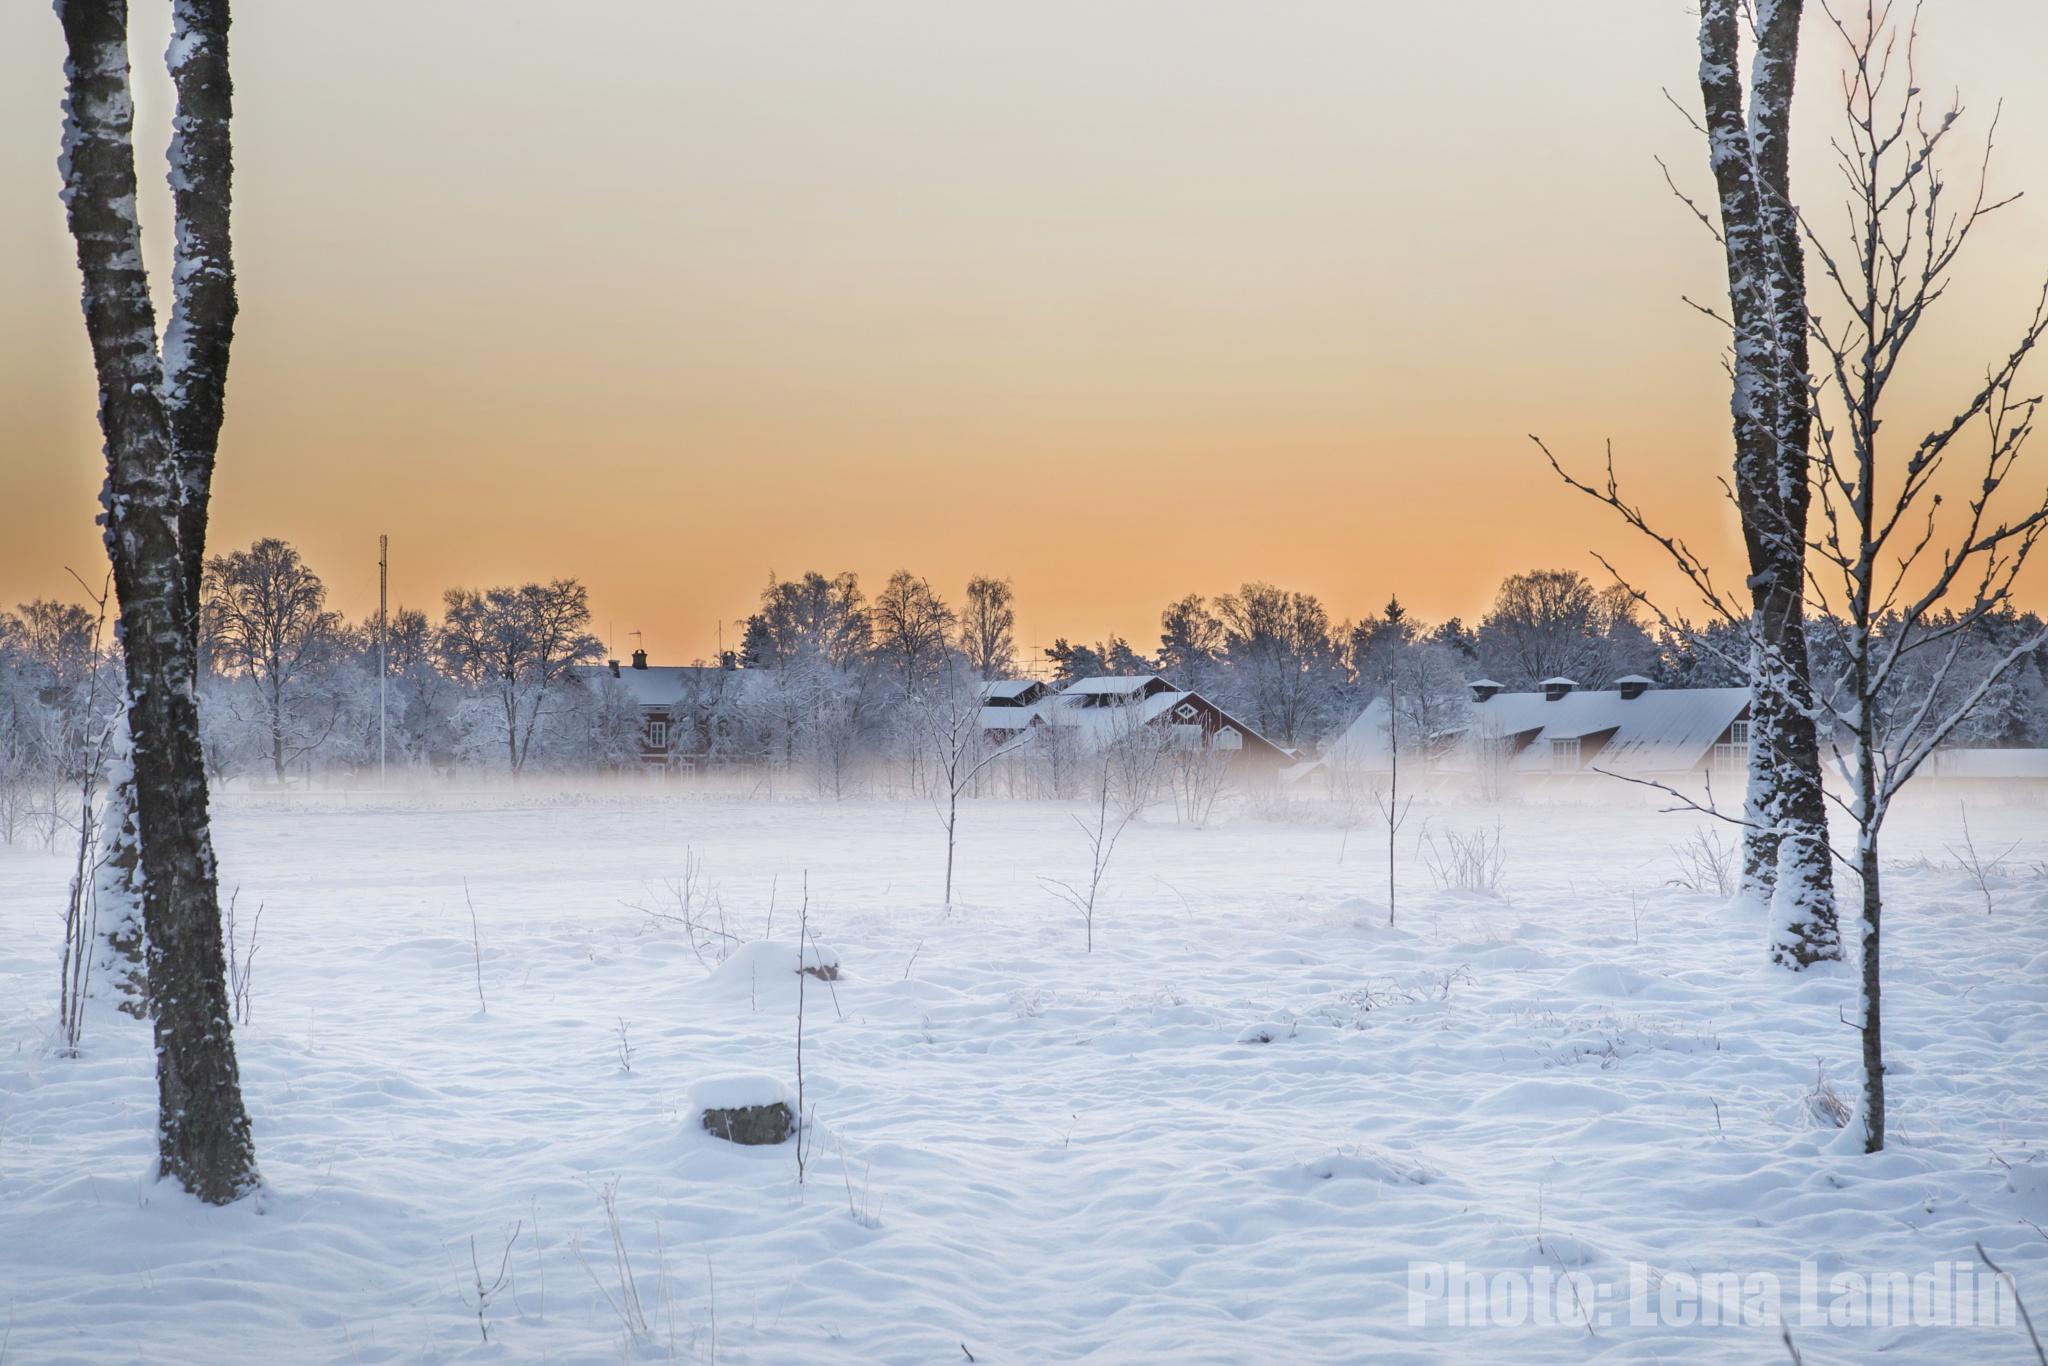 Cold sunrise by LenaLadde